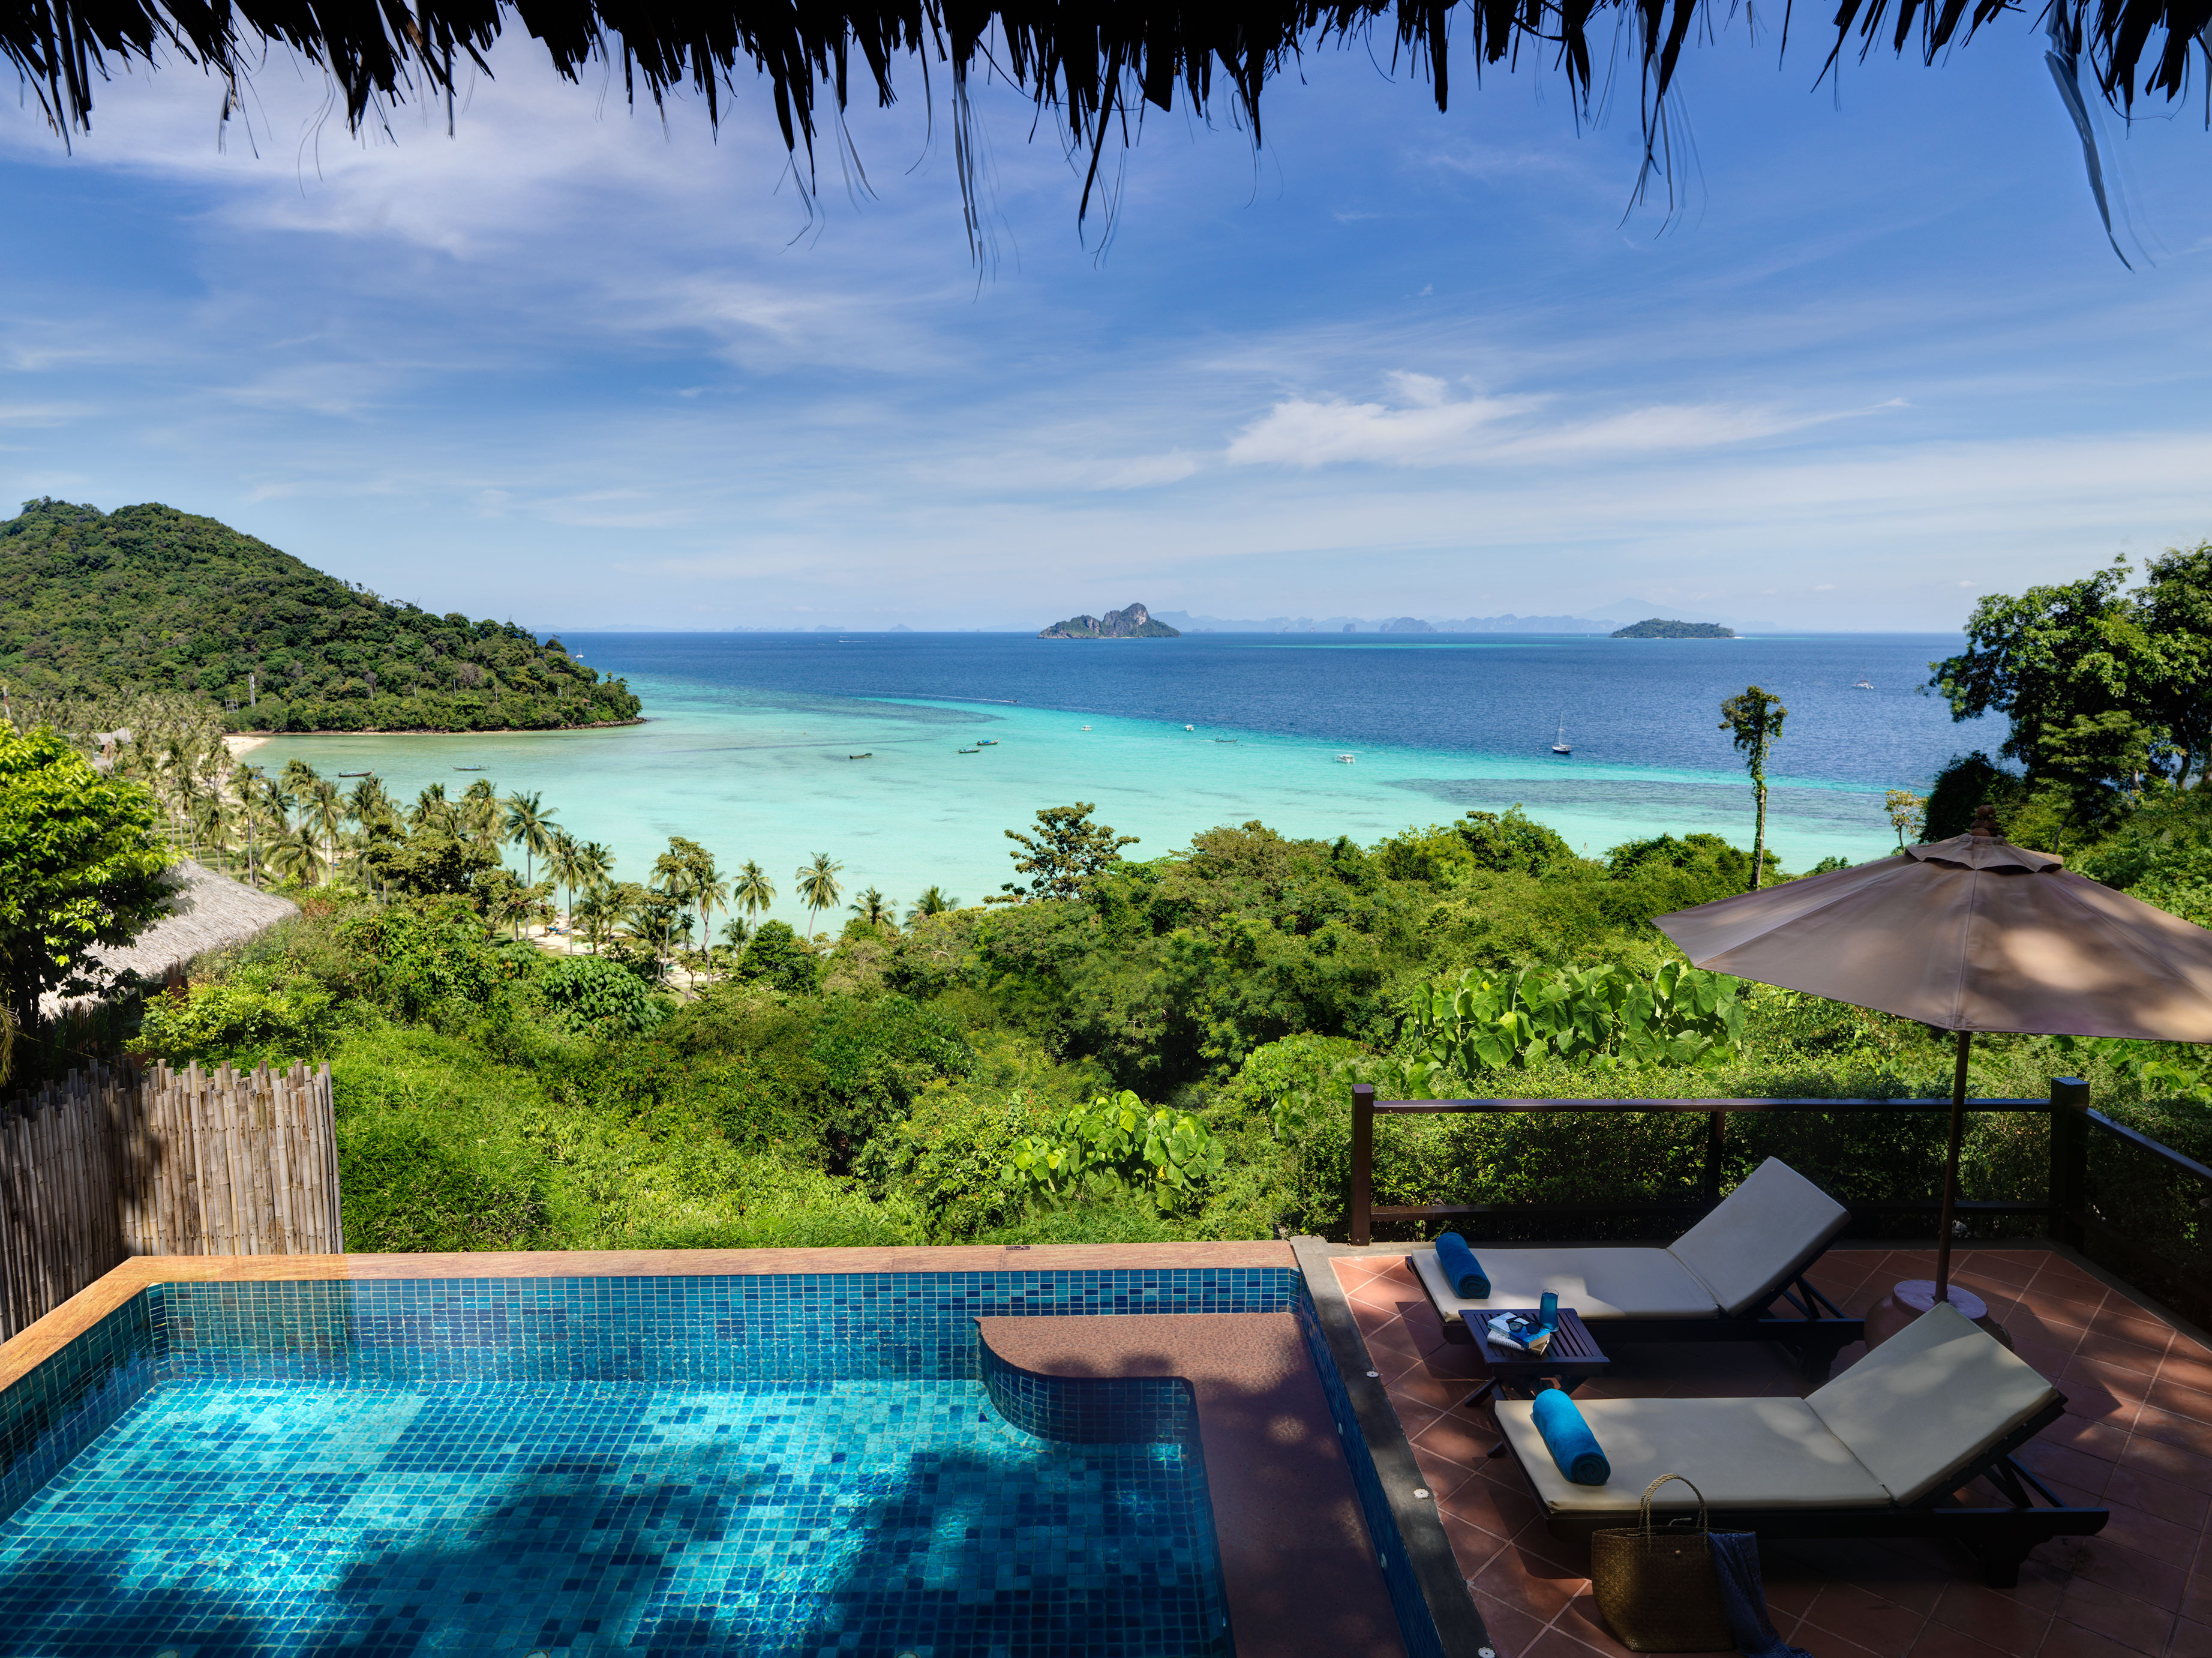 NEW LOOK PHI PHI ISLAND VILLAGE BEACH RESORT - DELIVERING ASIA